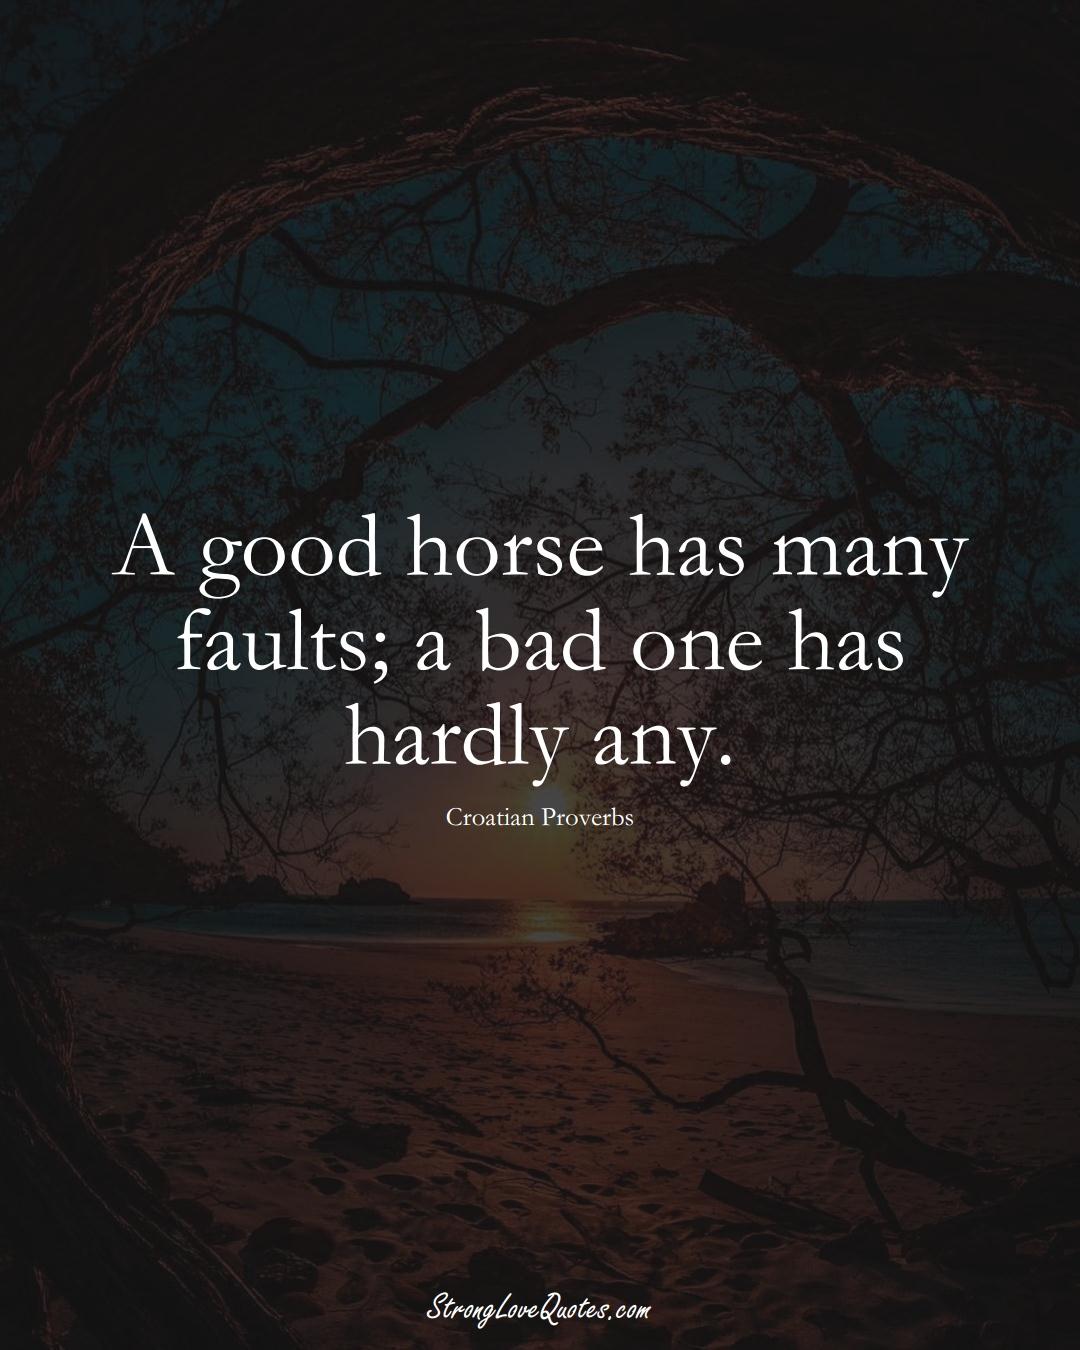 A good horse has many faults; a bad one has hardly any. (Croatian Sayings);  #EuropeanSayings